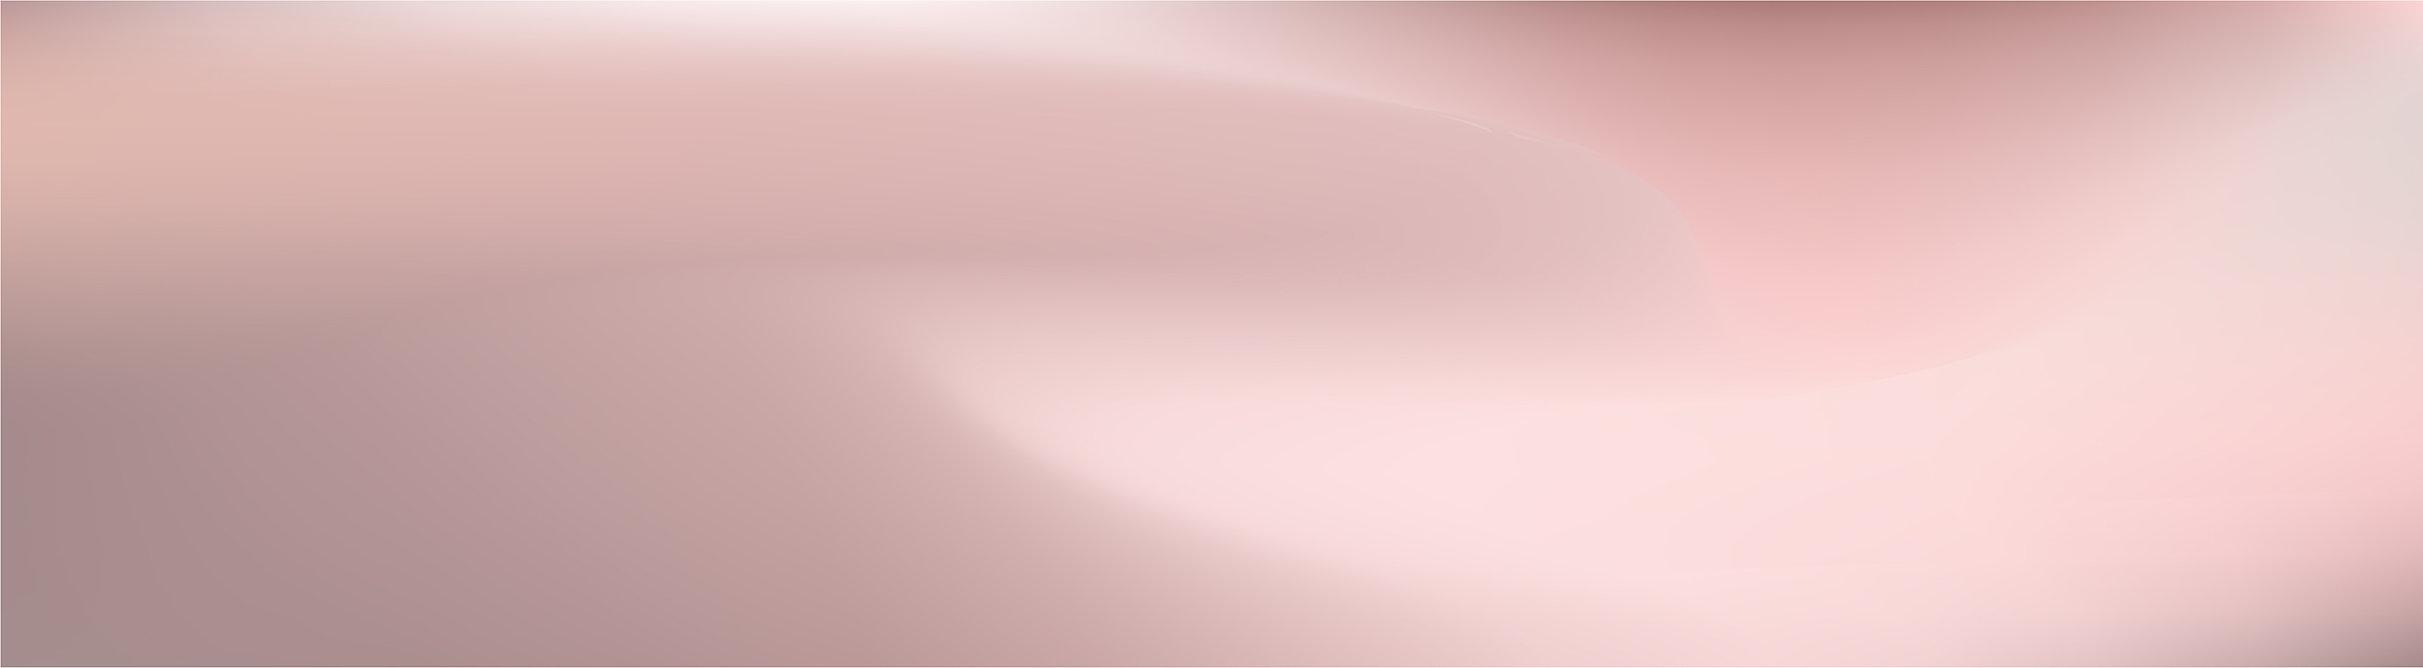 gradient header.jpg